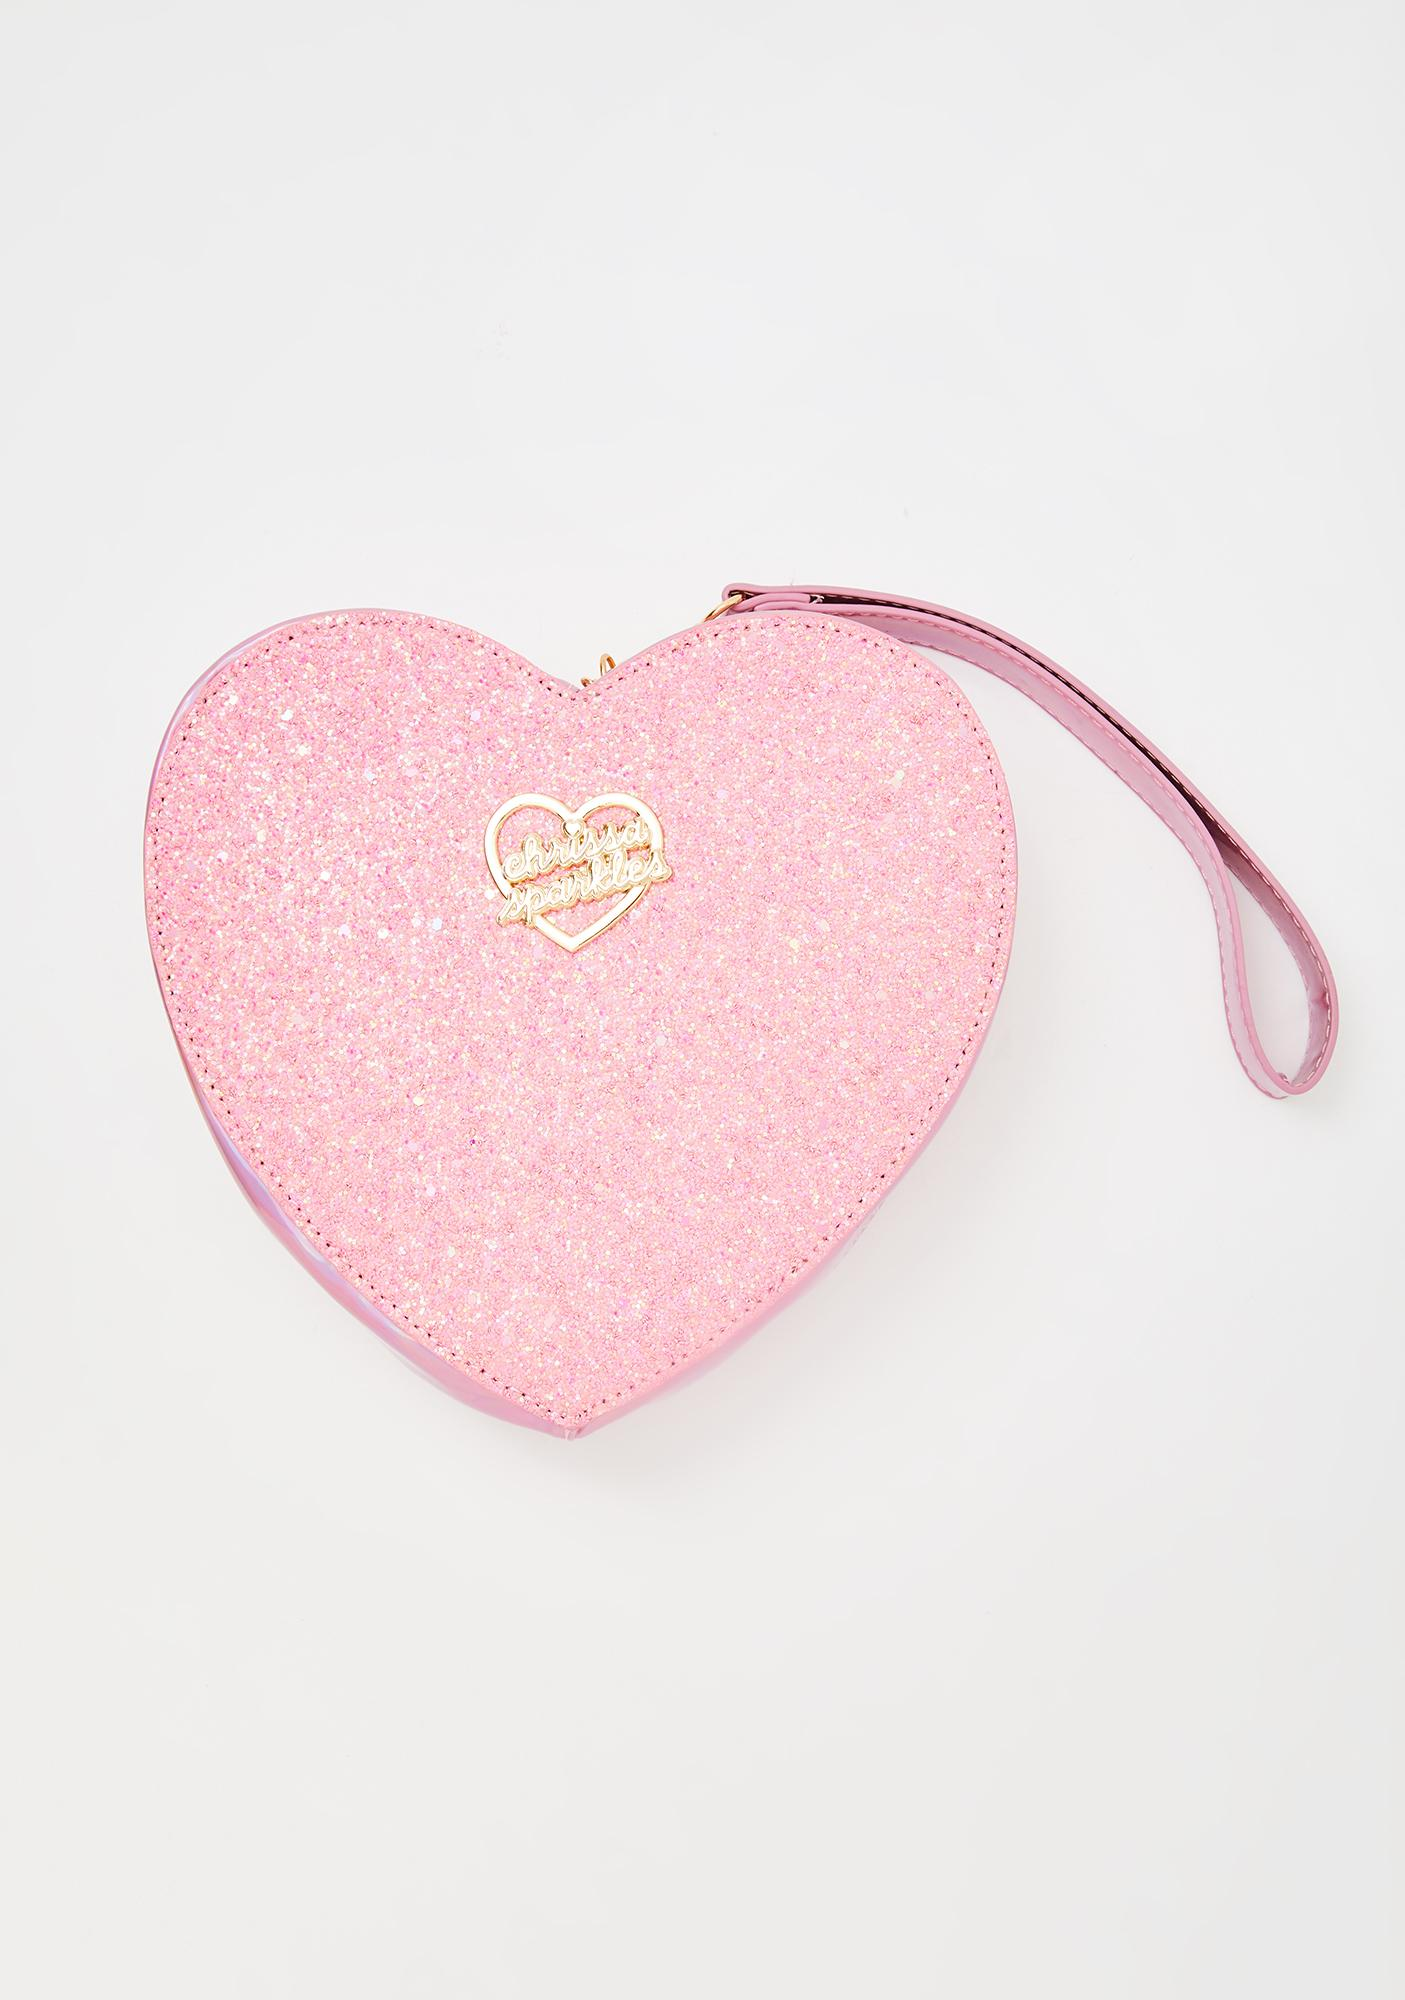 Chrissa Sparkles Glitter My Heart Clutch